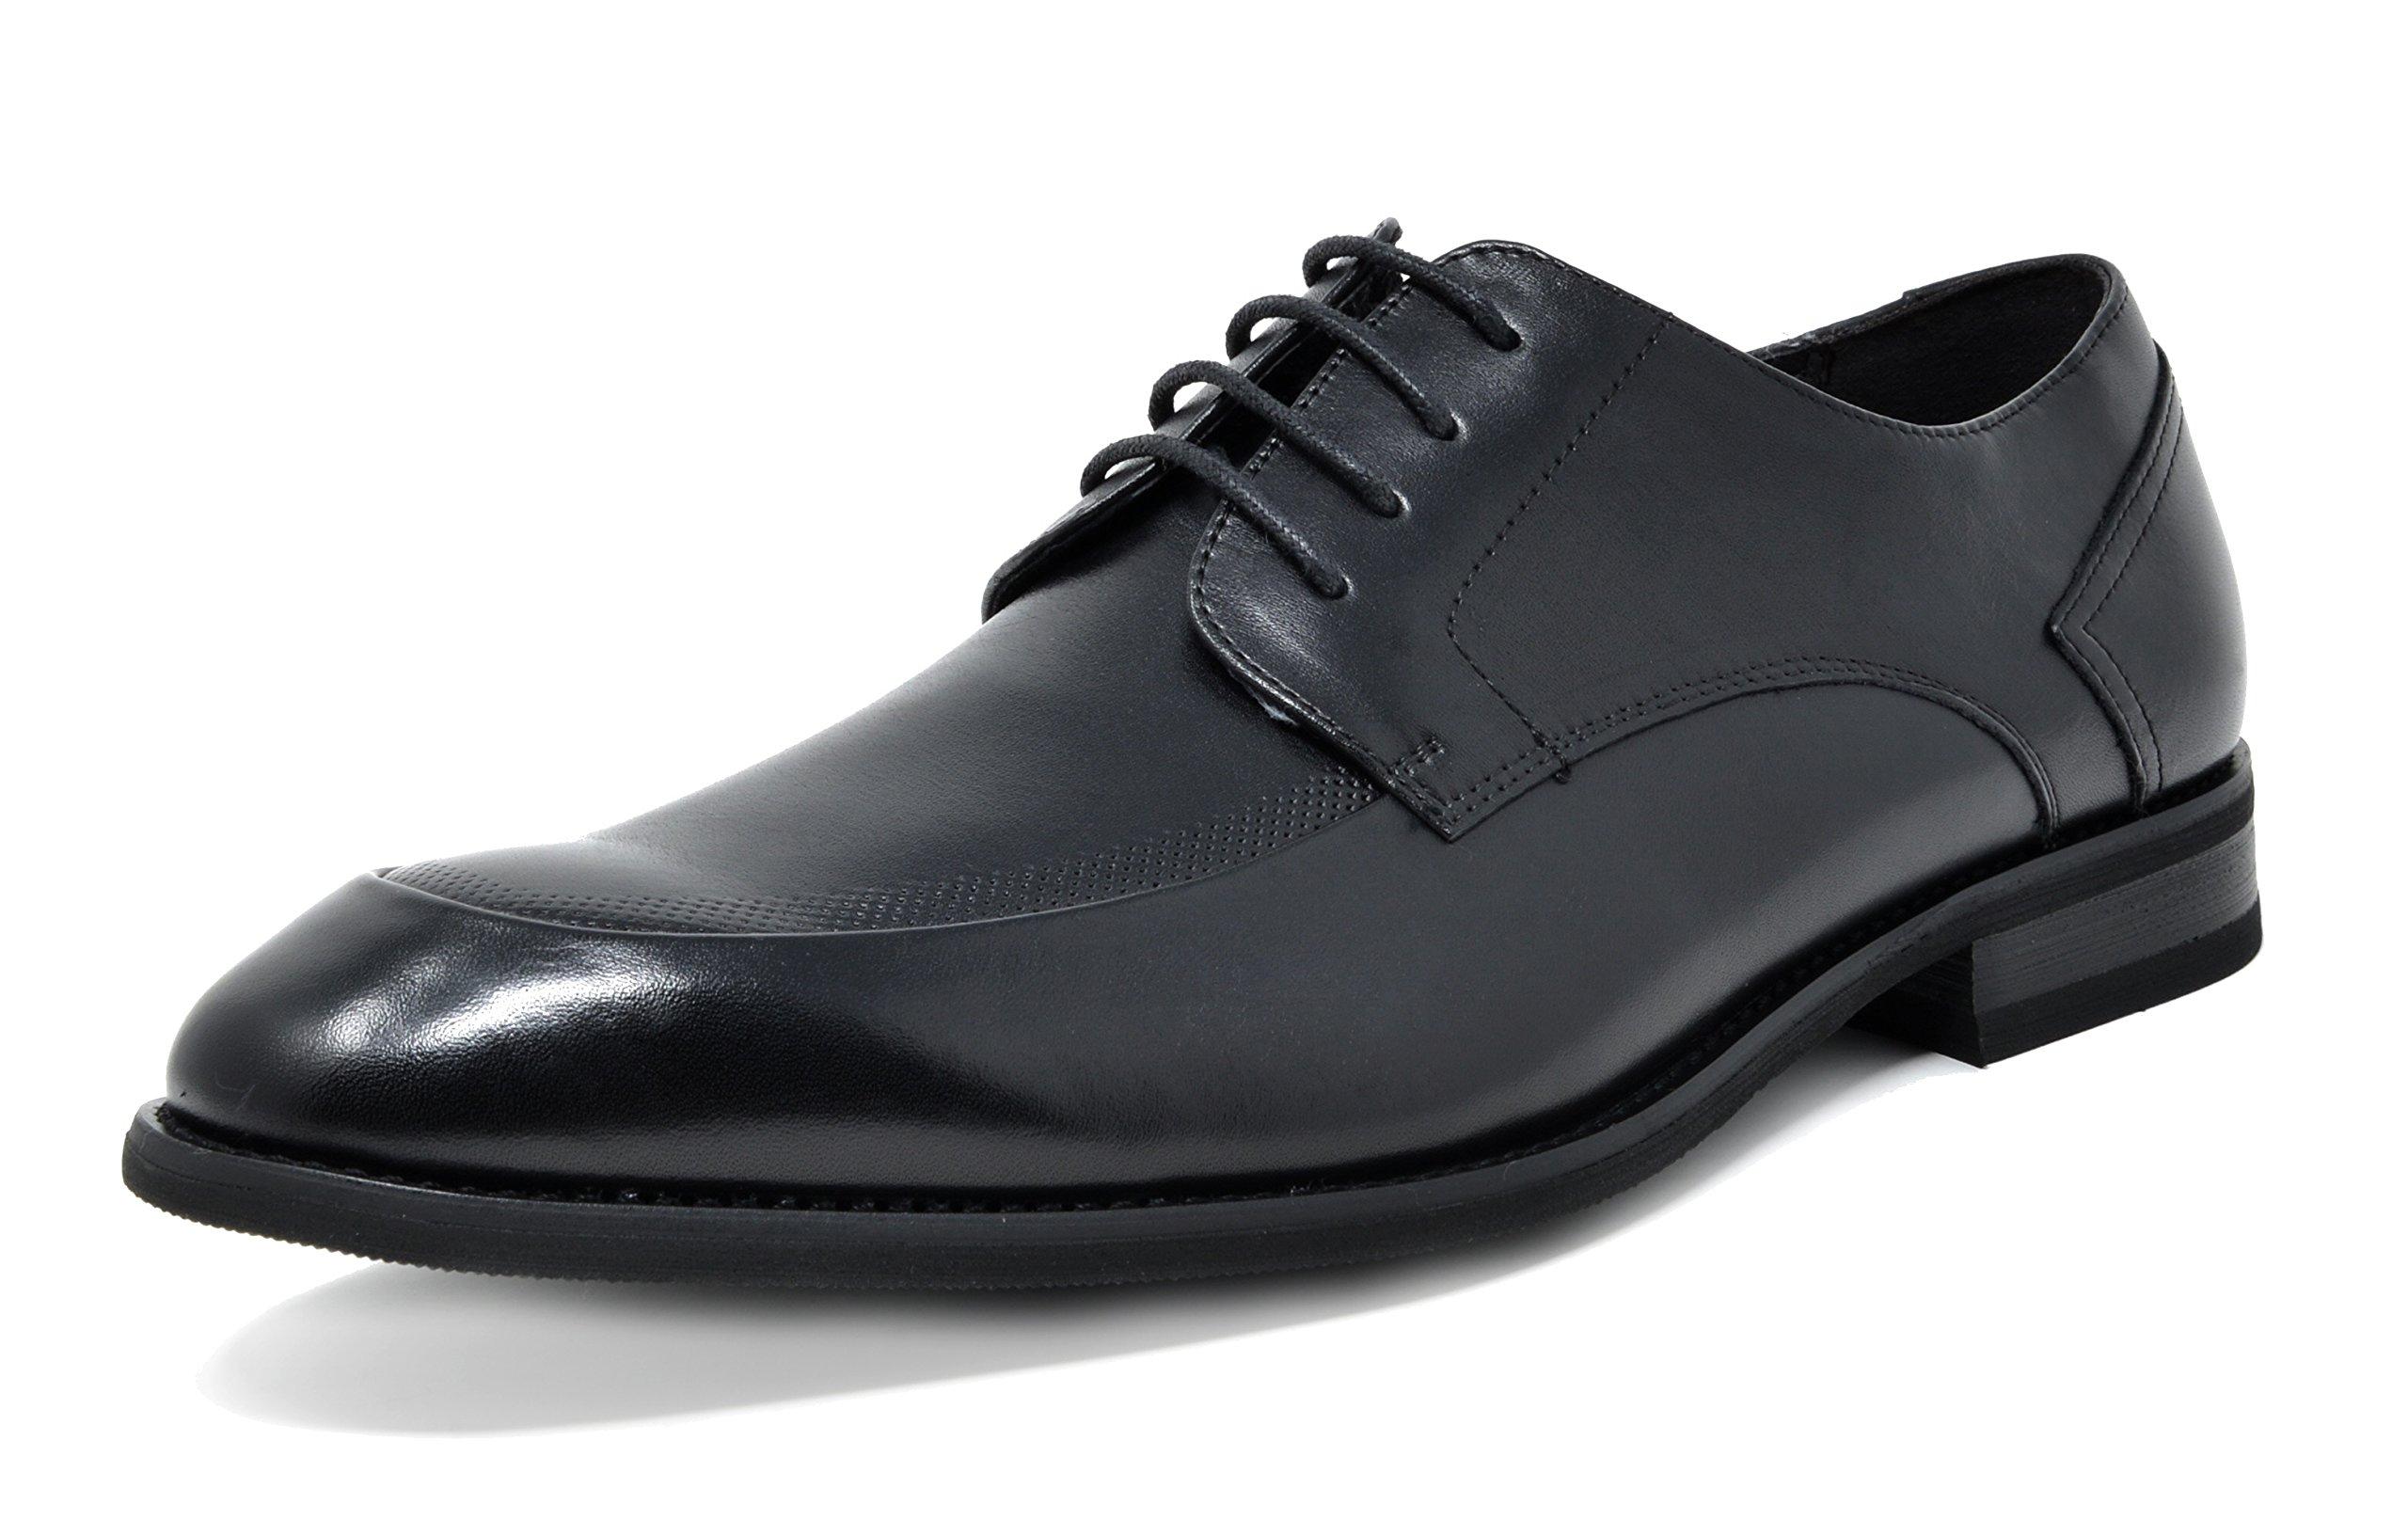 Bruno Marc Men's Washington-3 Black Leather Lined Dress Oxfords Shoes Size 14 M US